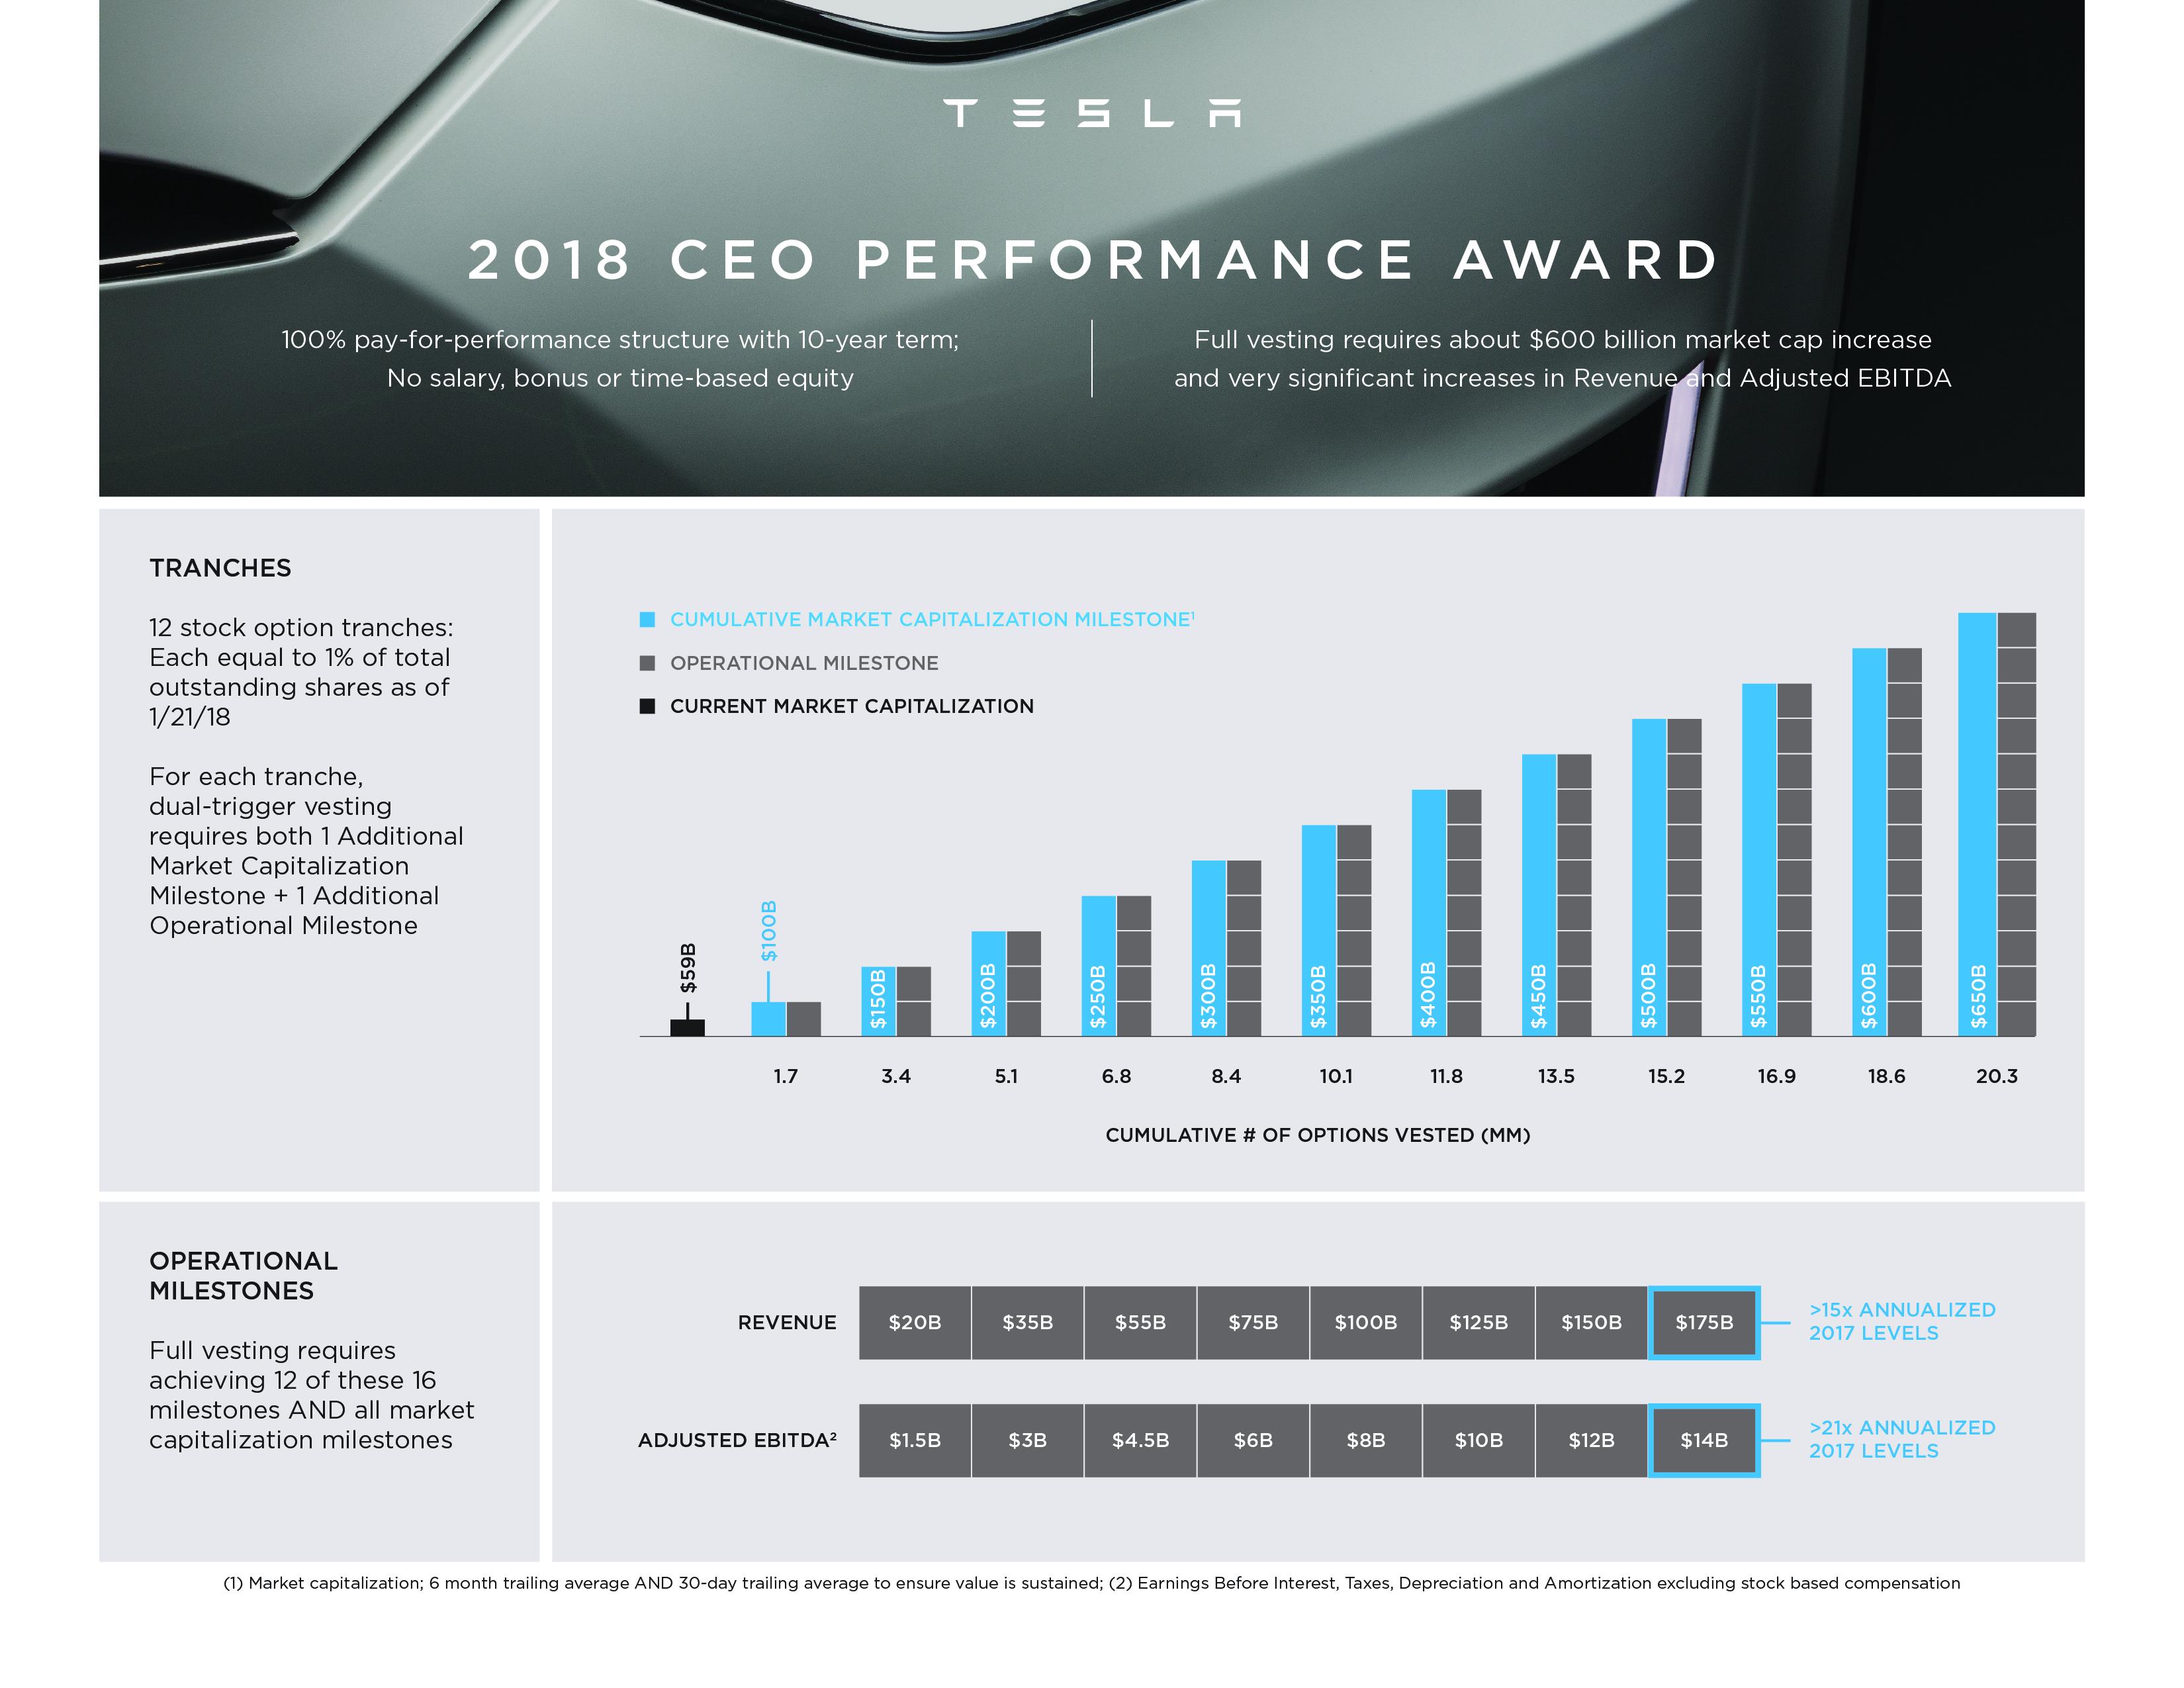 Elon Musk's compensation plan.